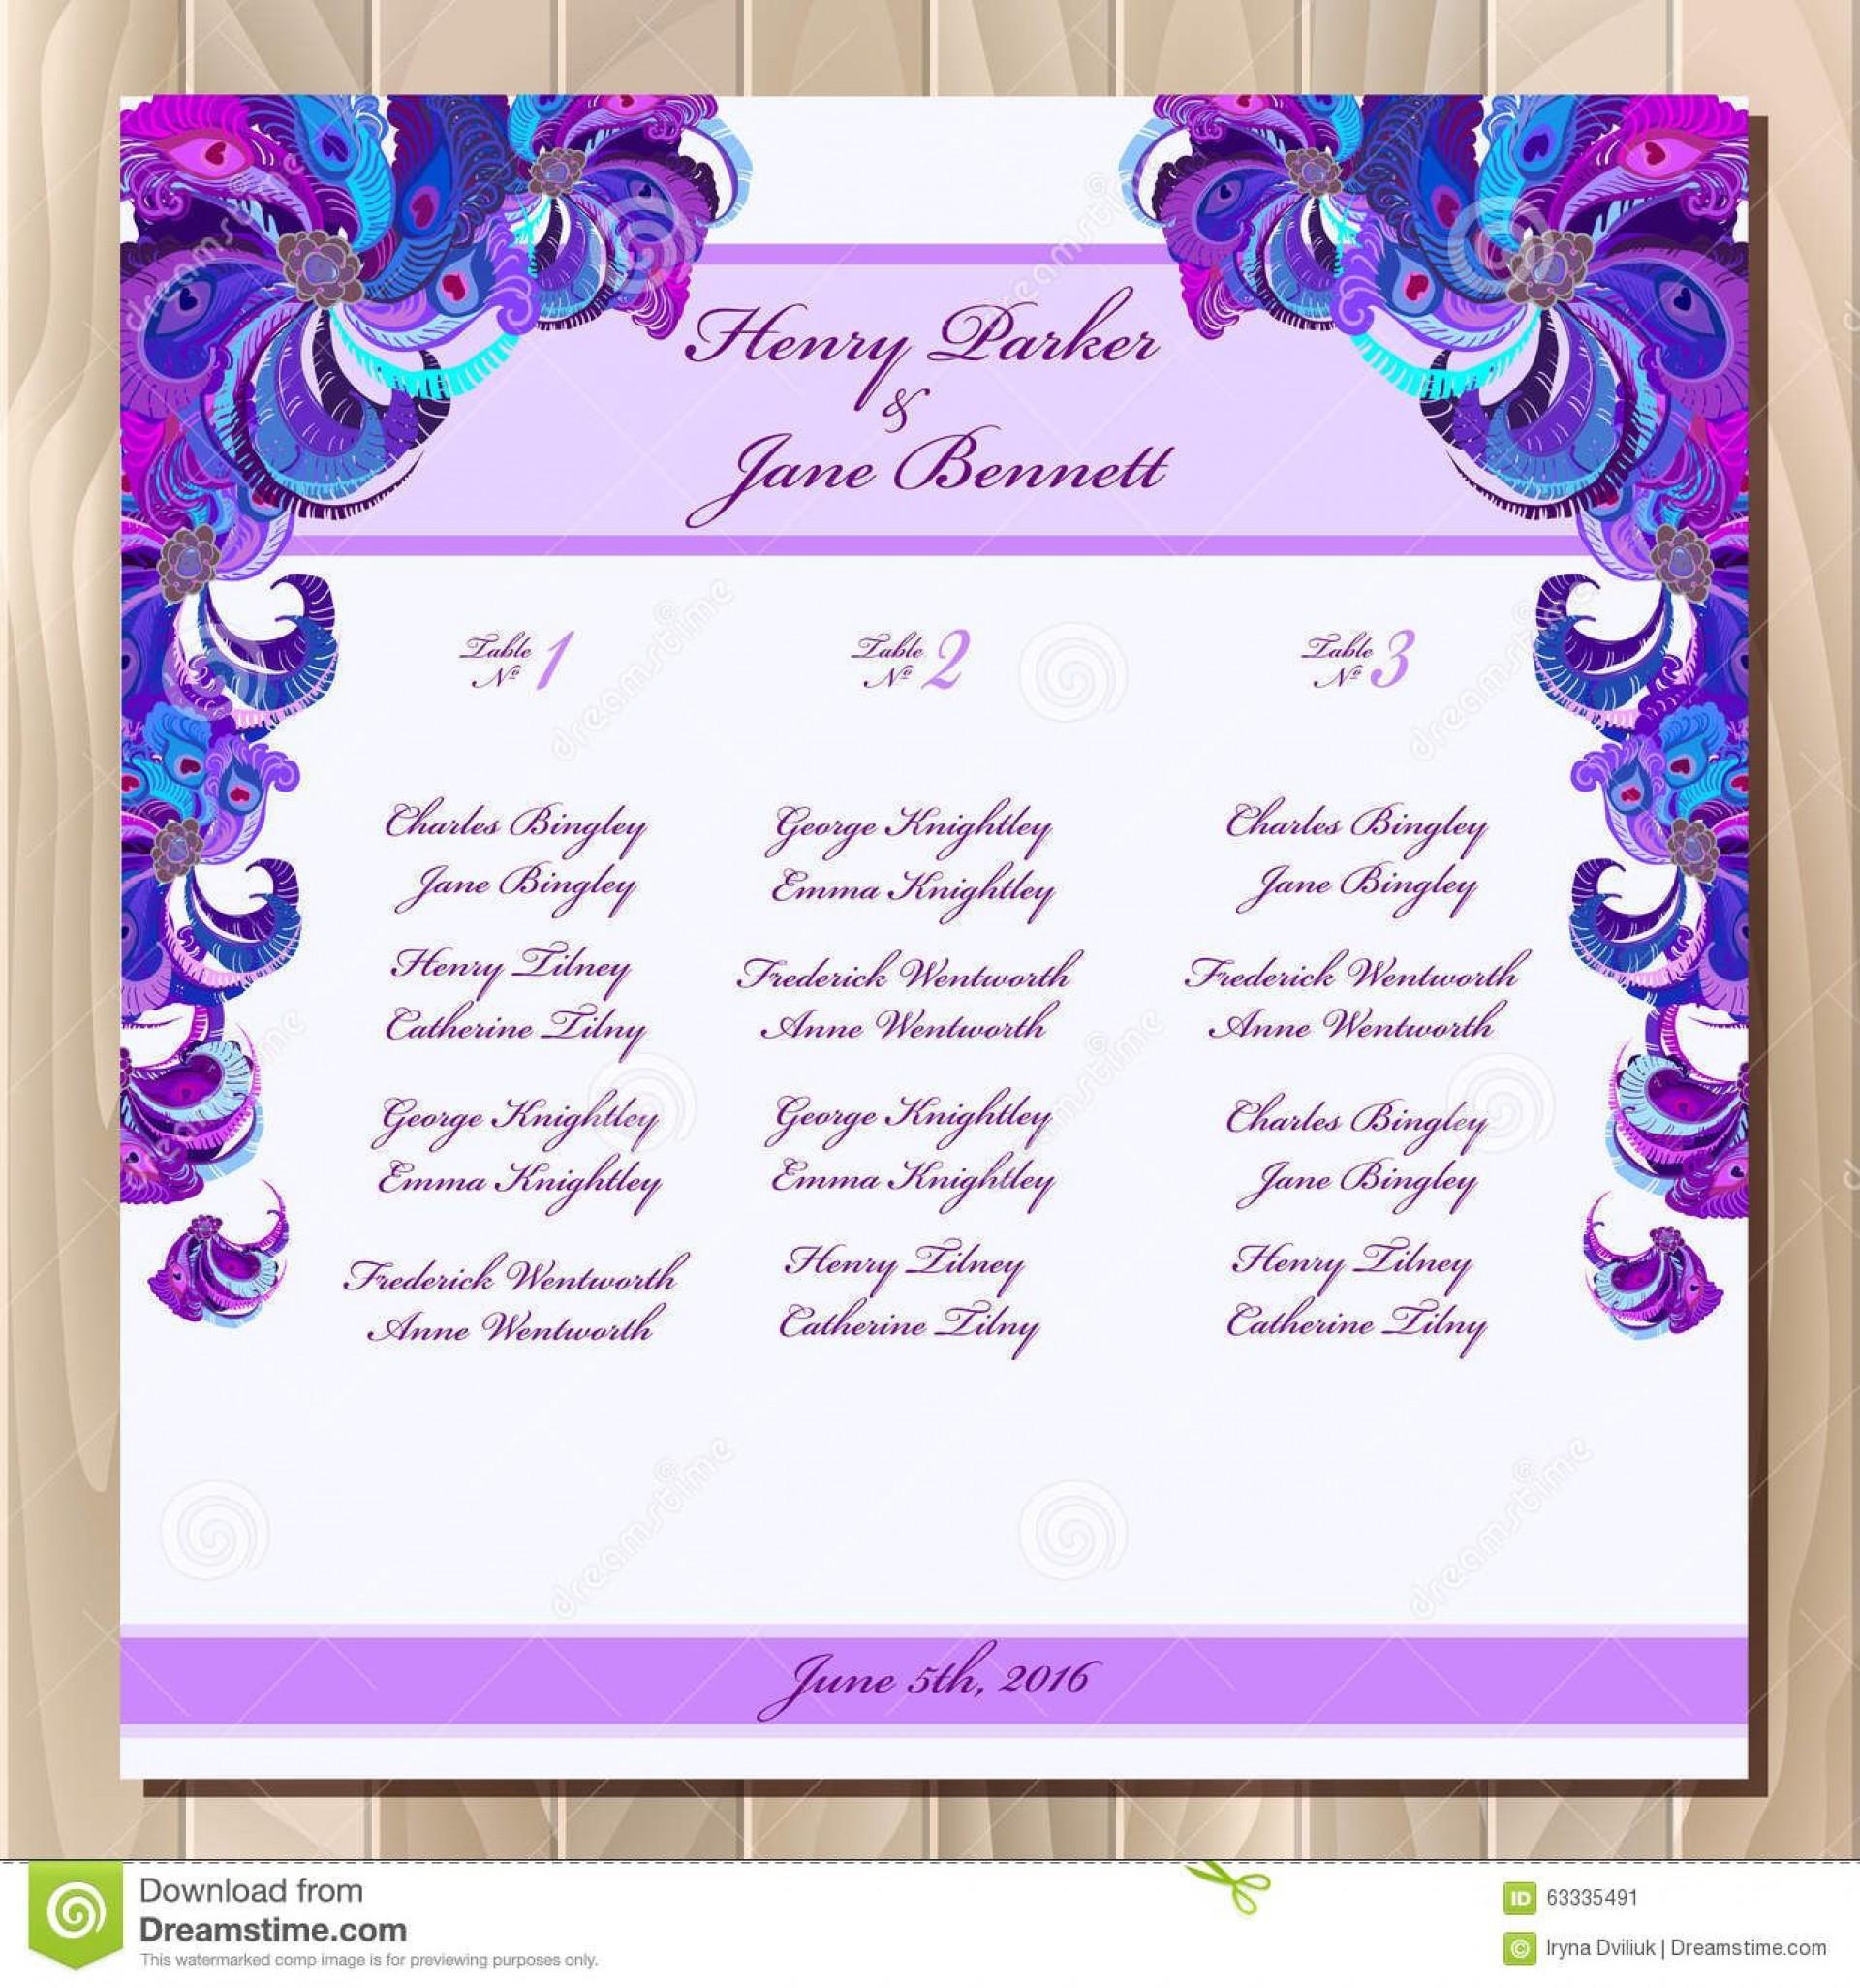 003 Surprising Wedding Guest List Excel Spreadsheet Template Highest Clarity 1920